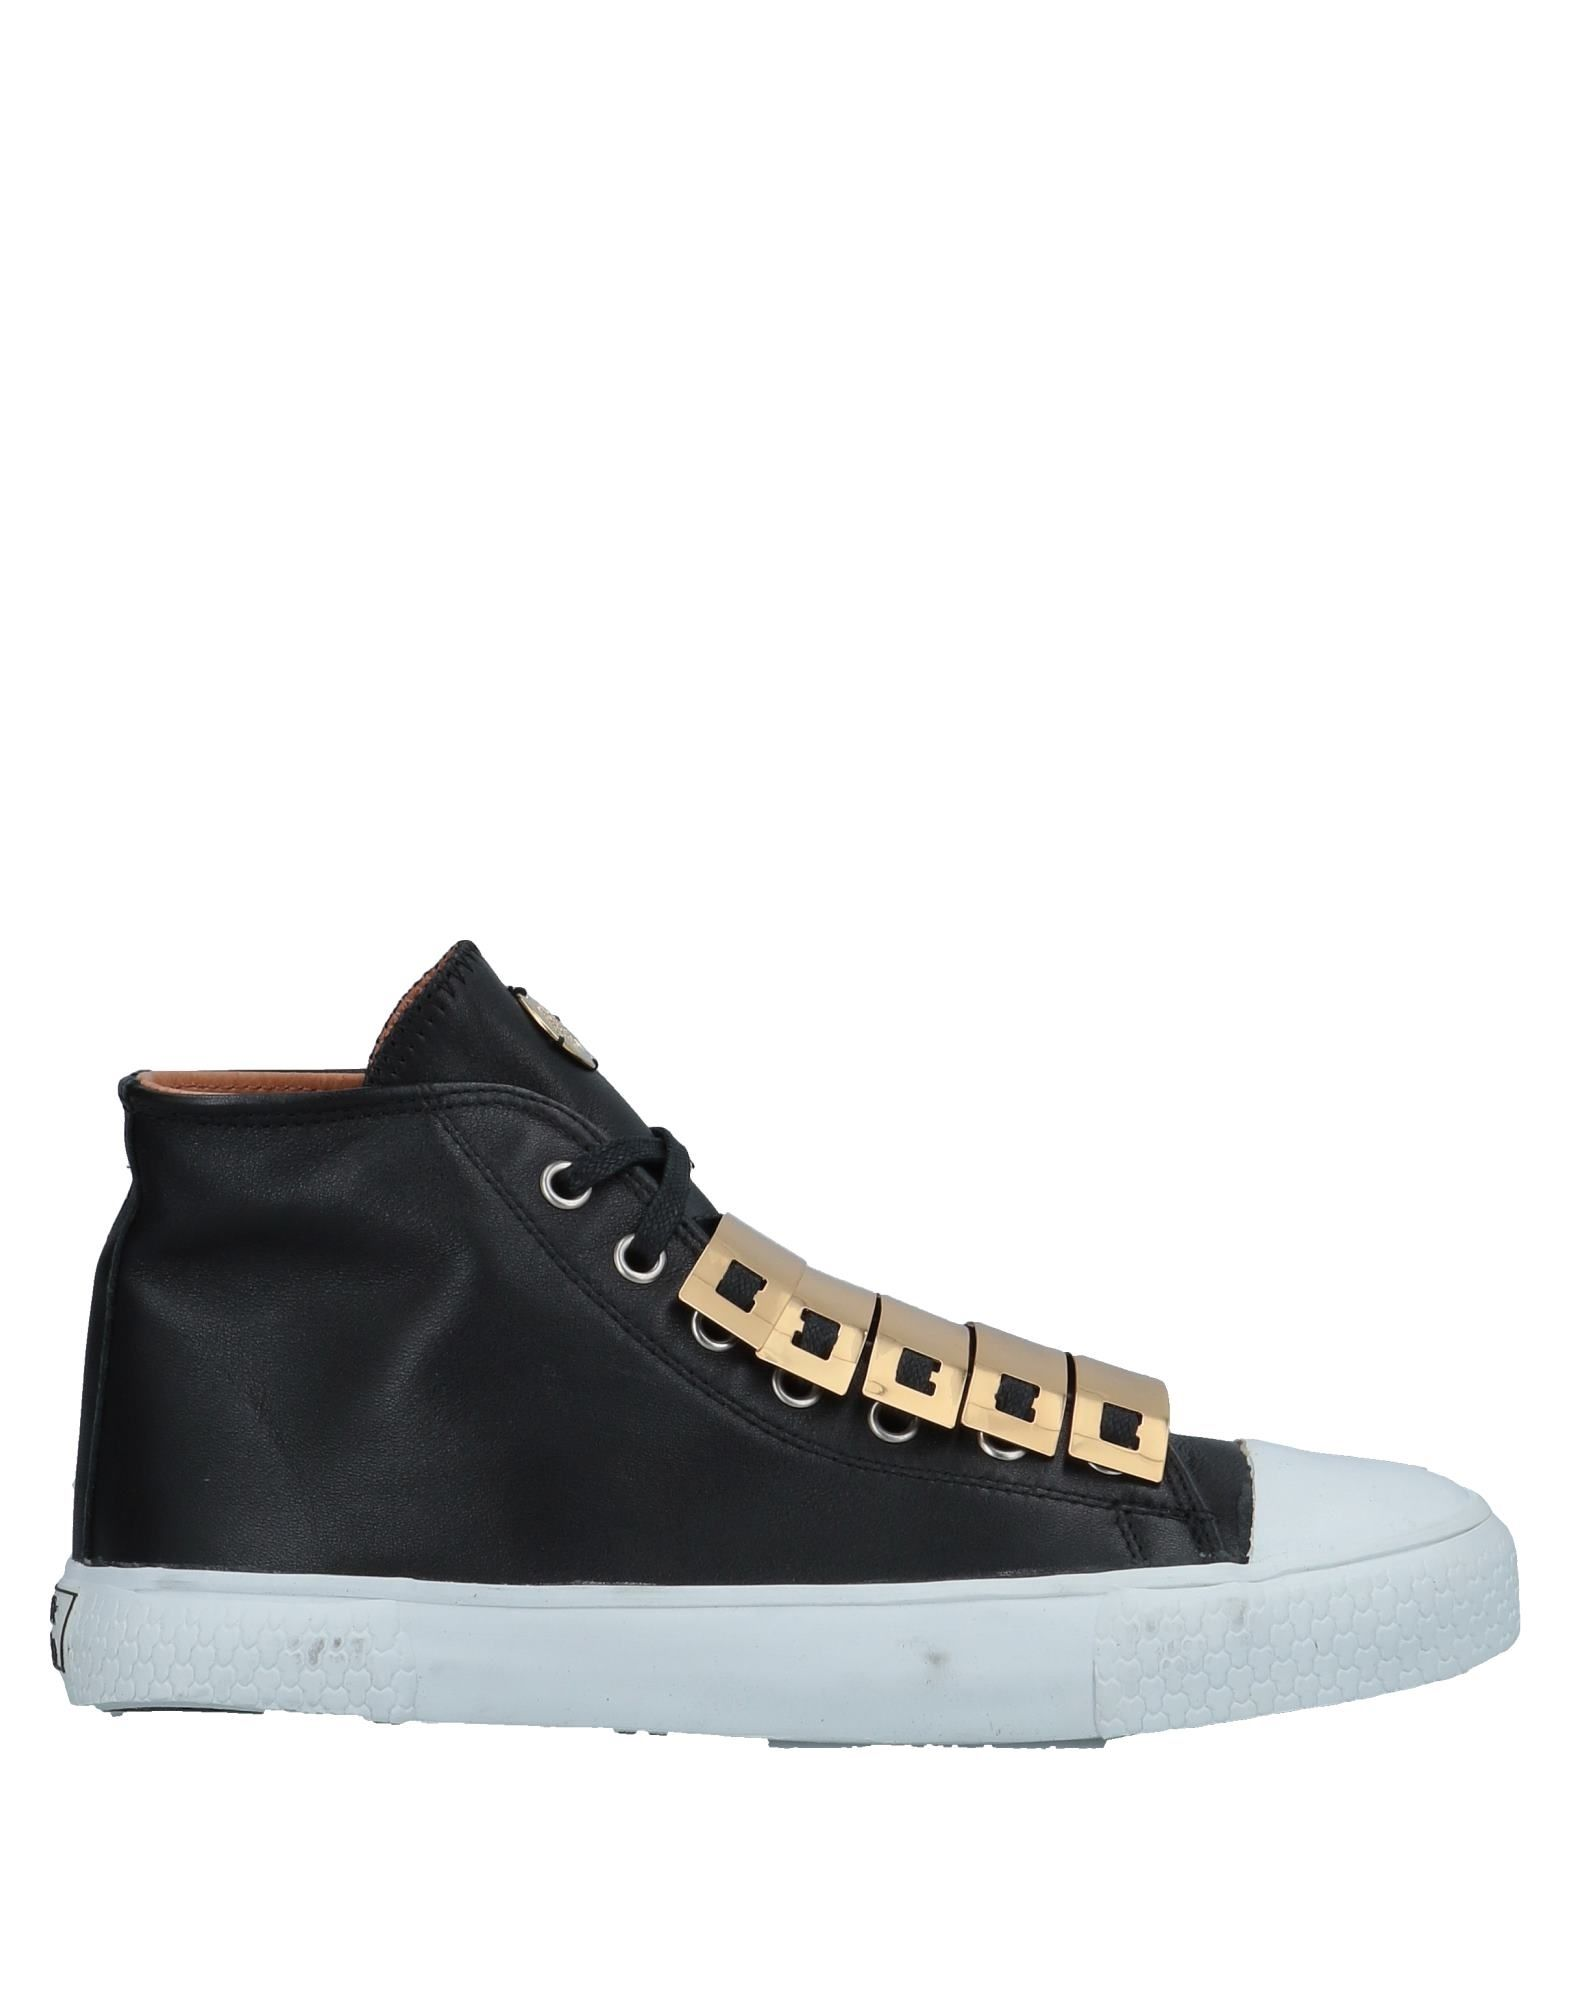 BLACK DIONISO Низкие кеды и кроссовки кеды кроссовки низкие huf liberty black camo